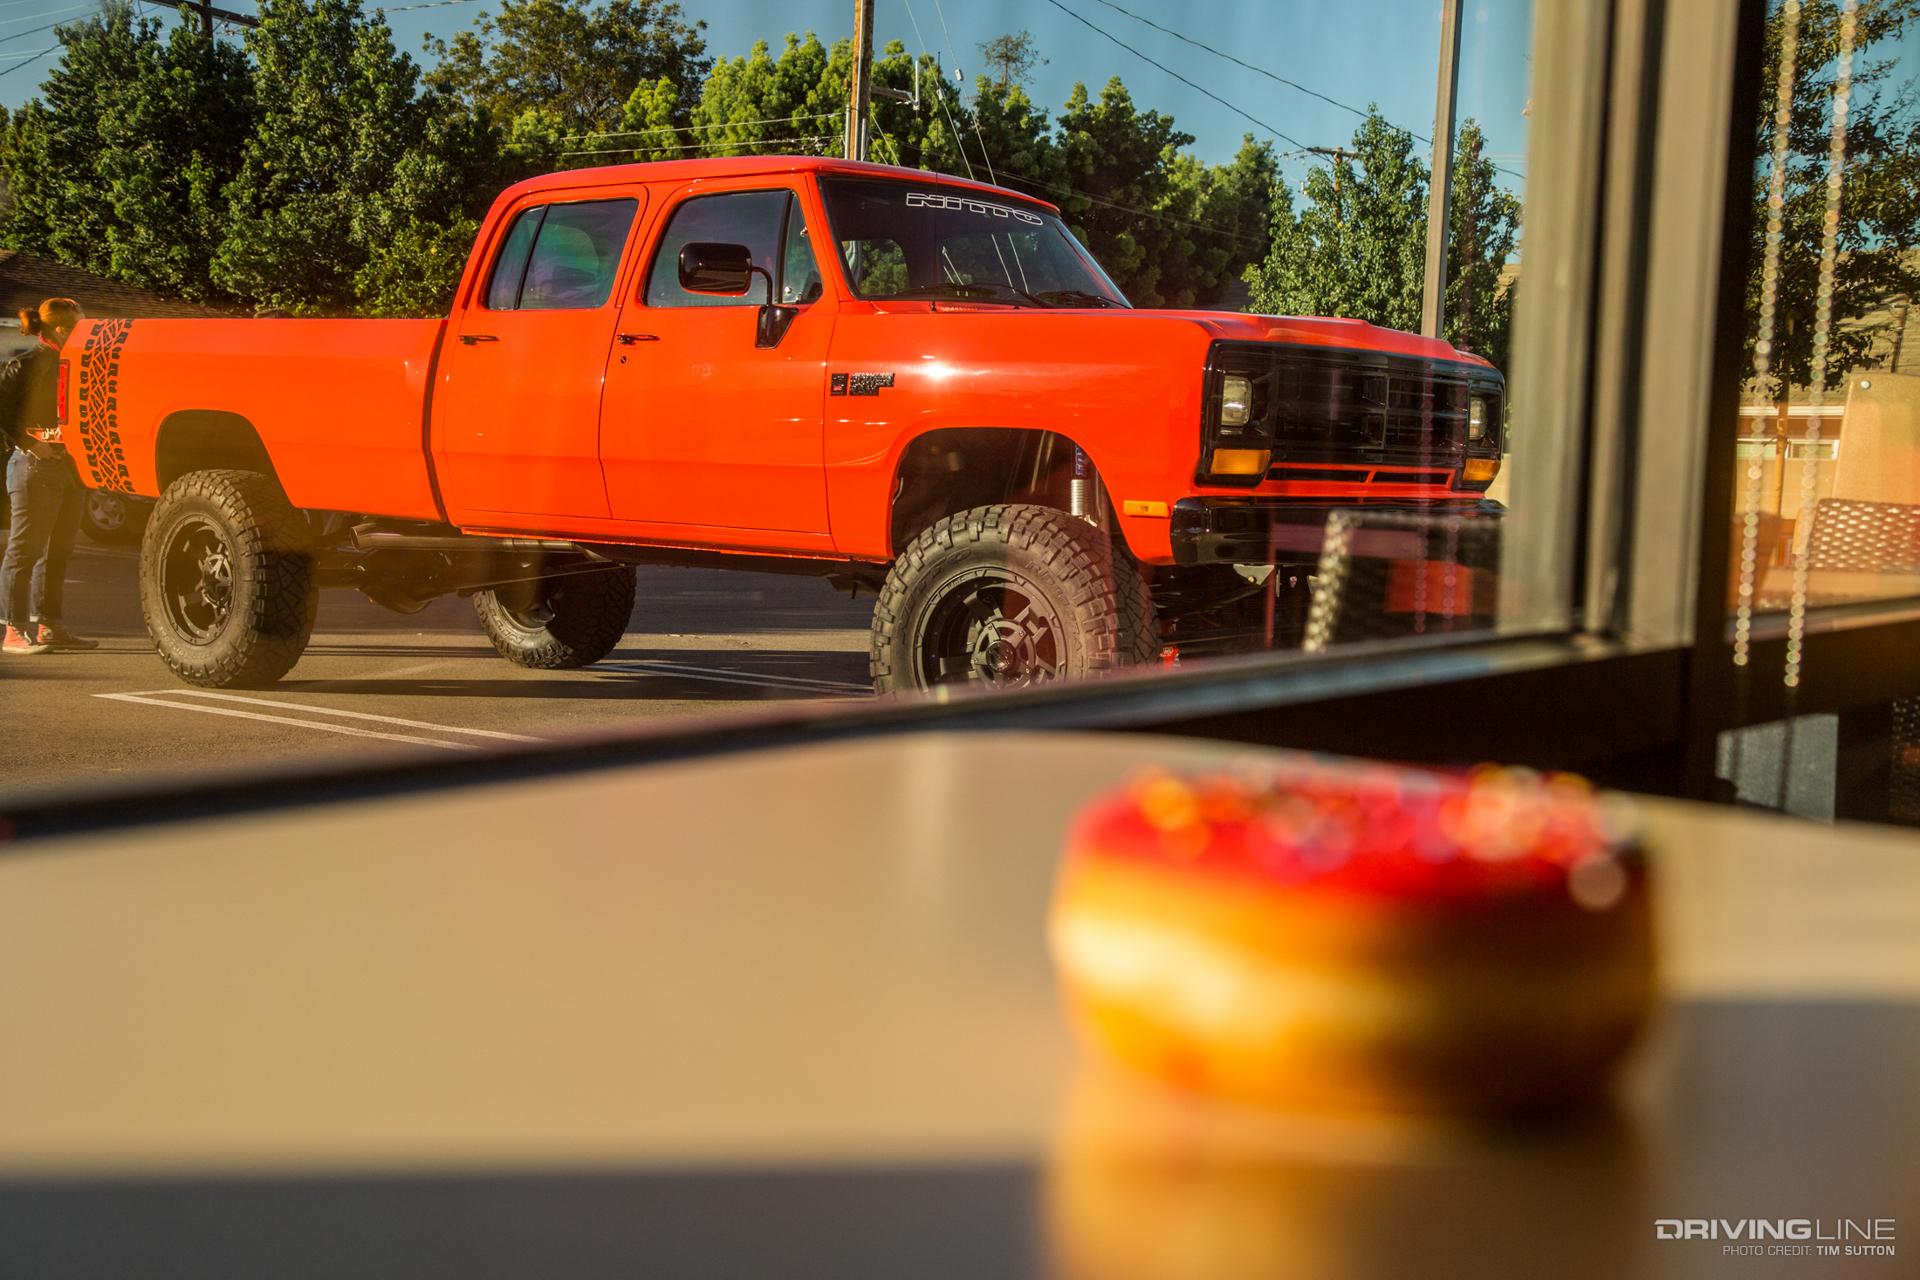 Dodge Ram 6bt Crew Cab Breakfast With The Lobster Wagon Drivingline